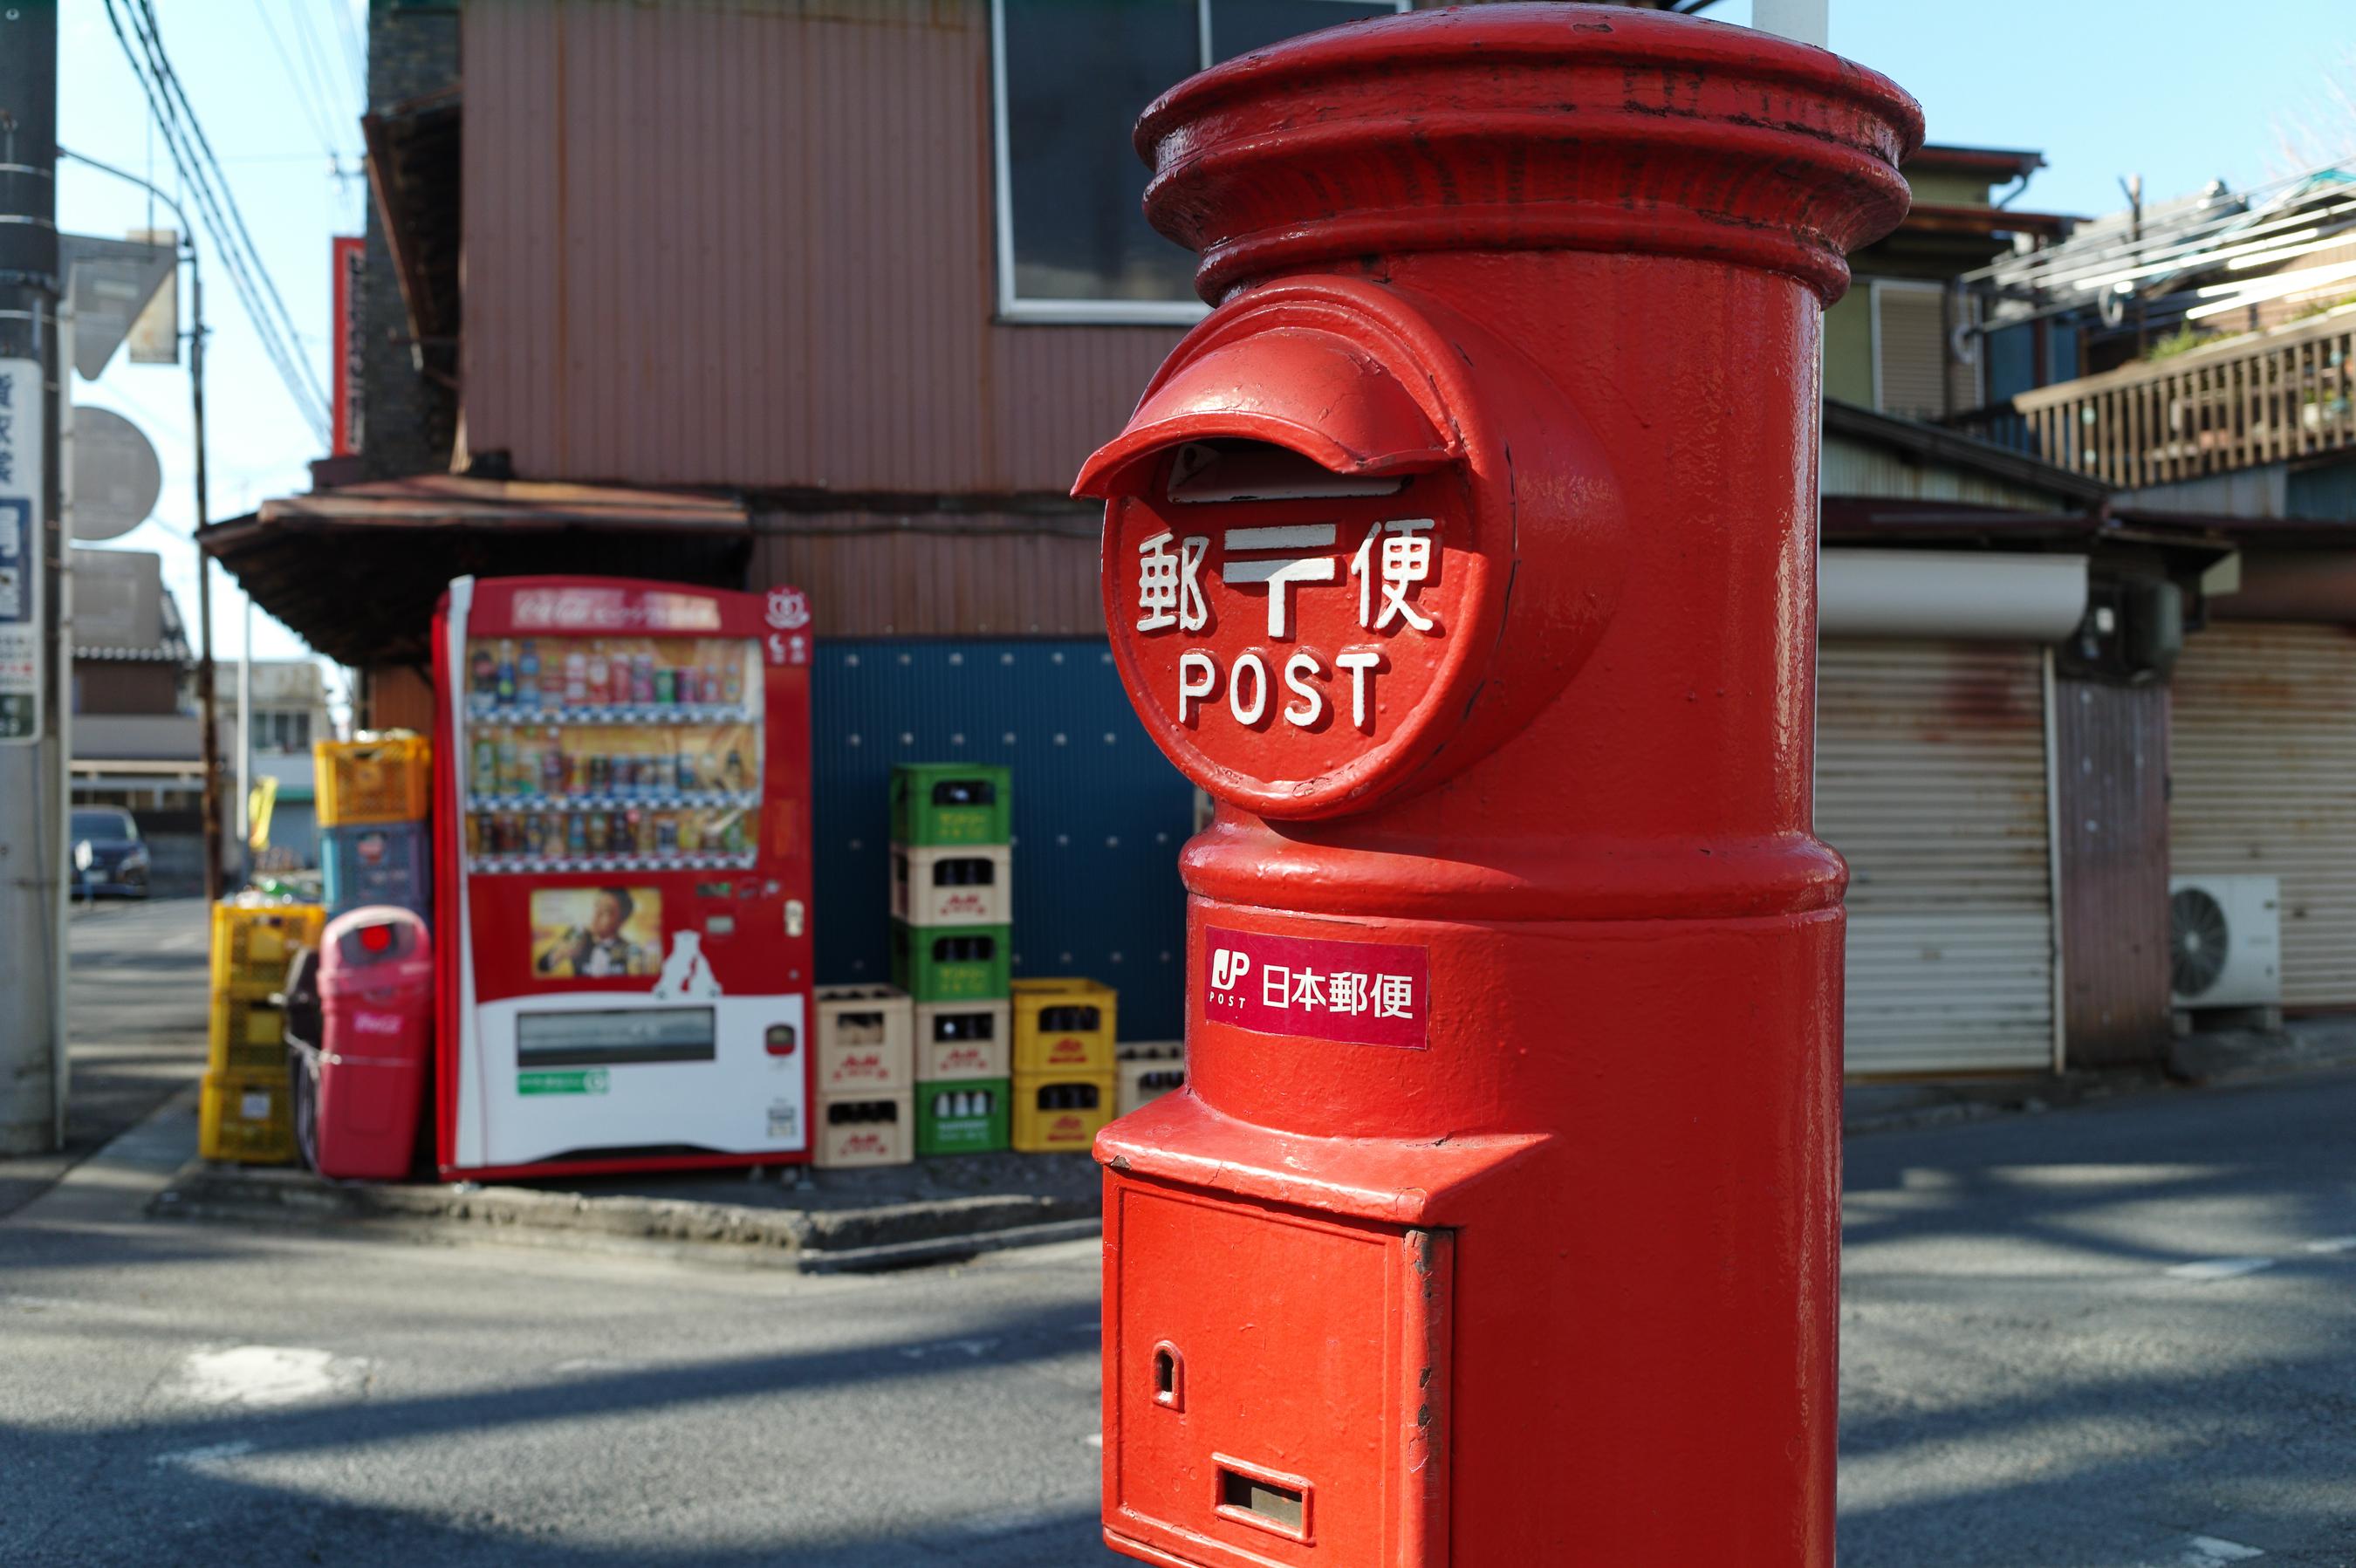 f:id:aoyama-takuro:20180212011041j:plain